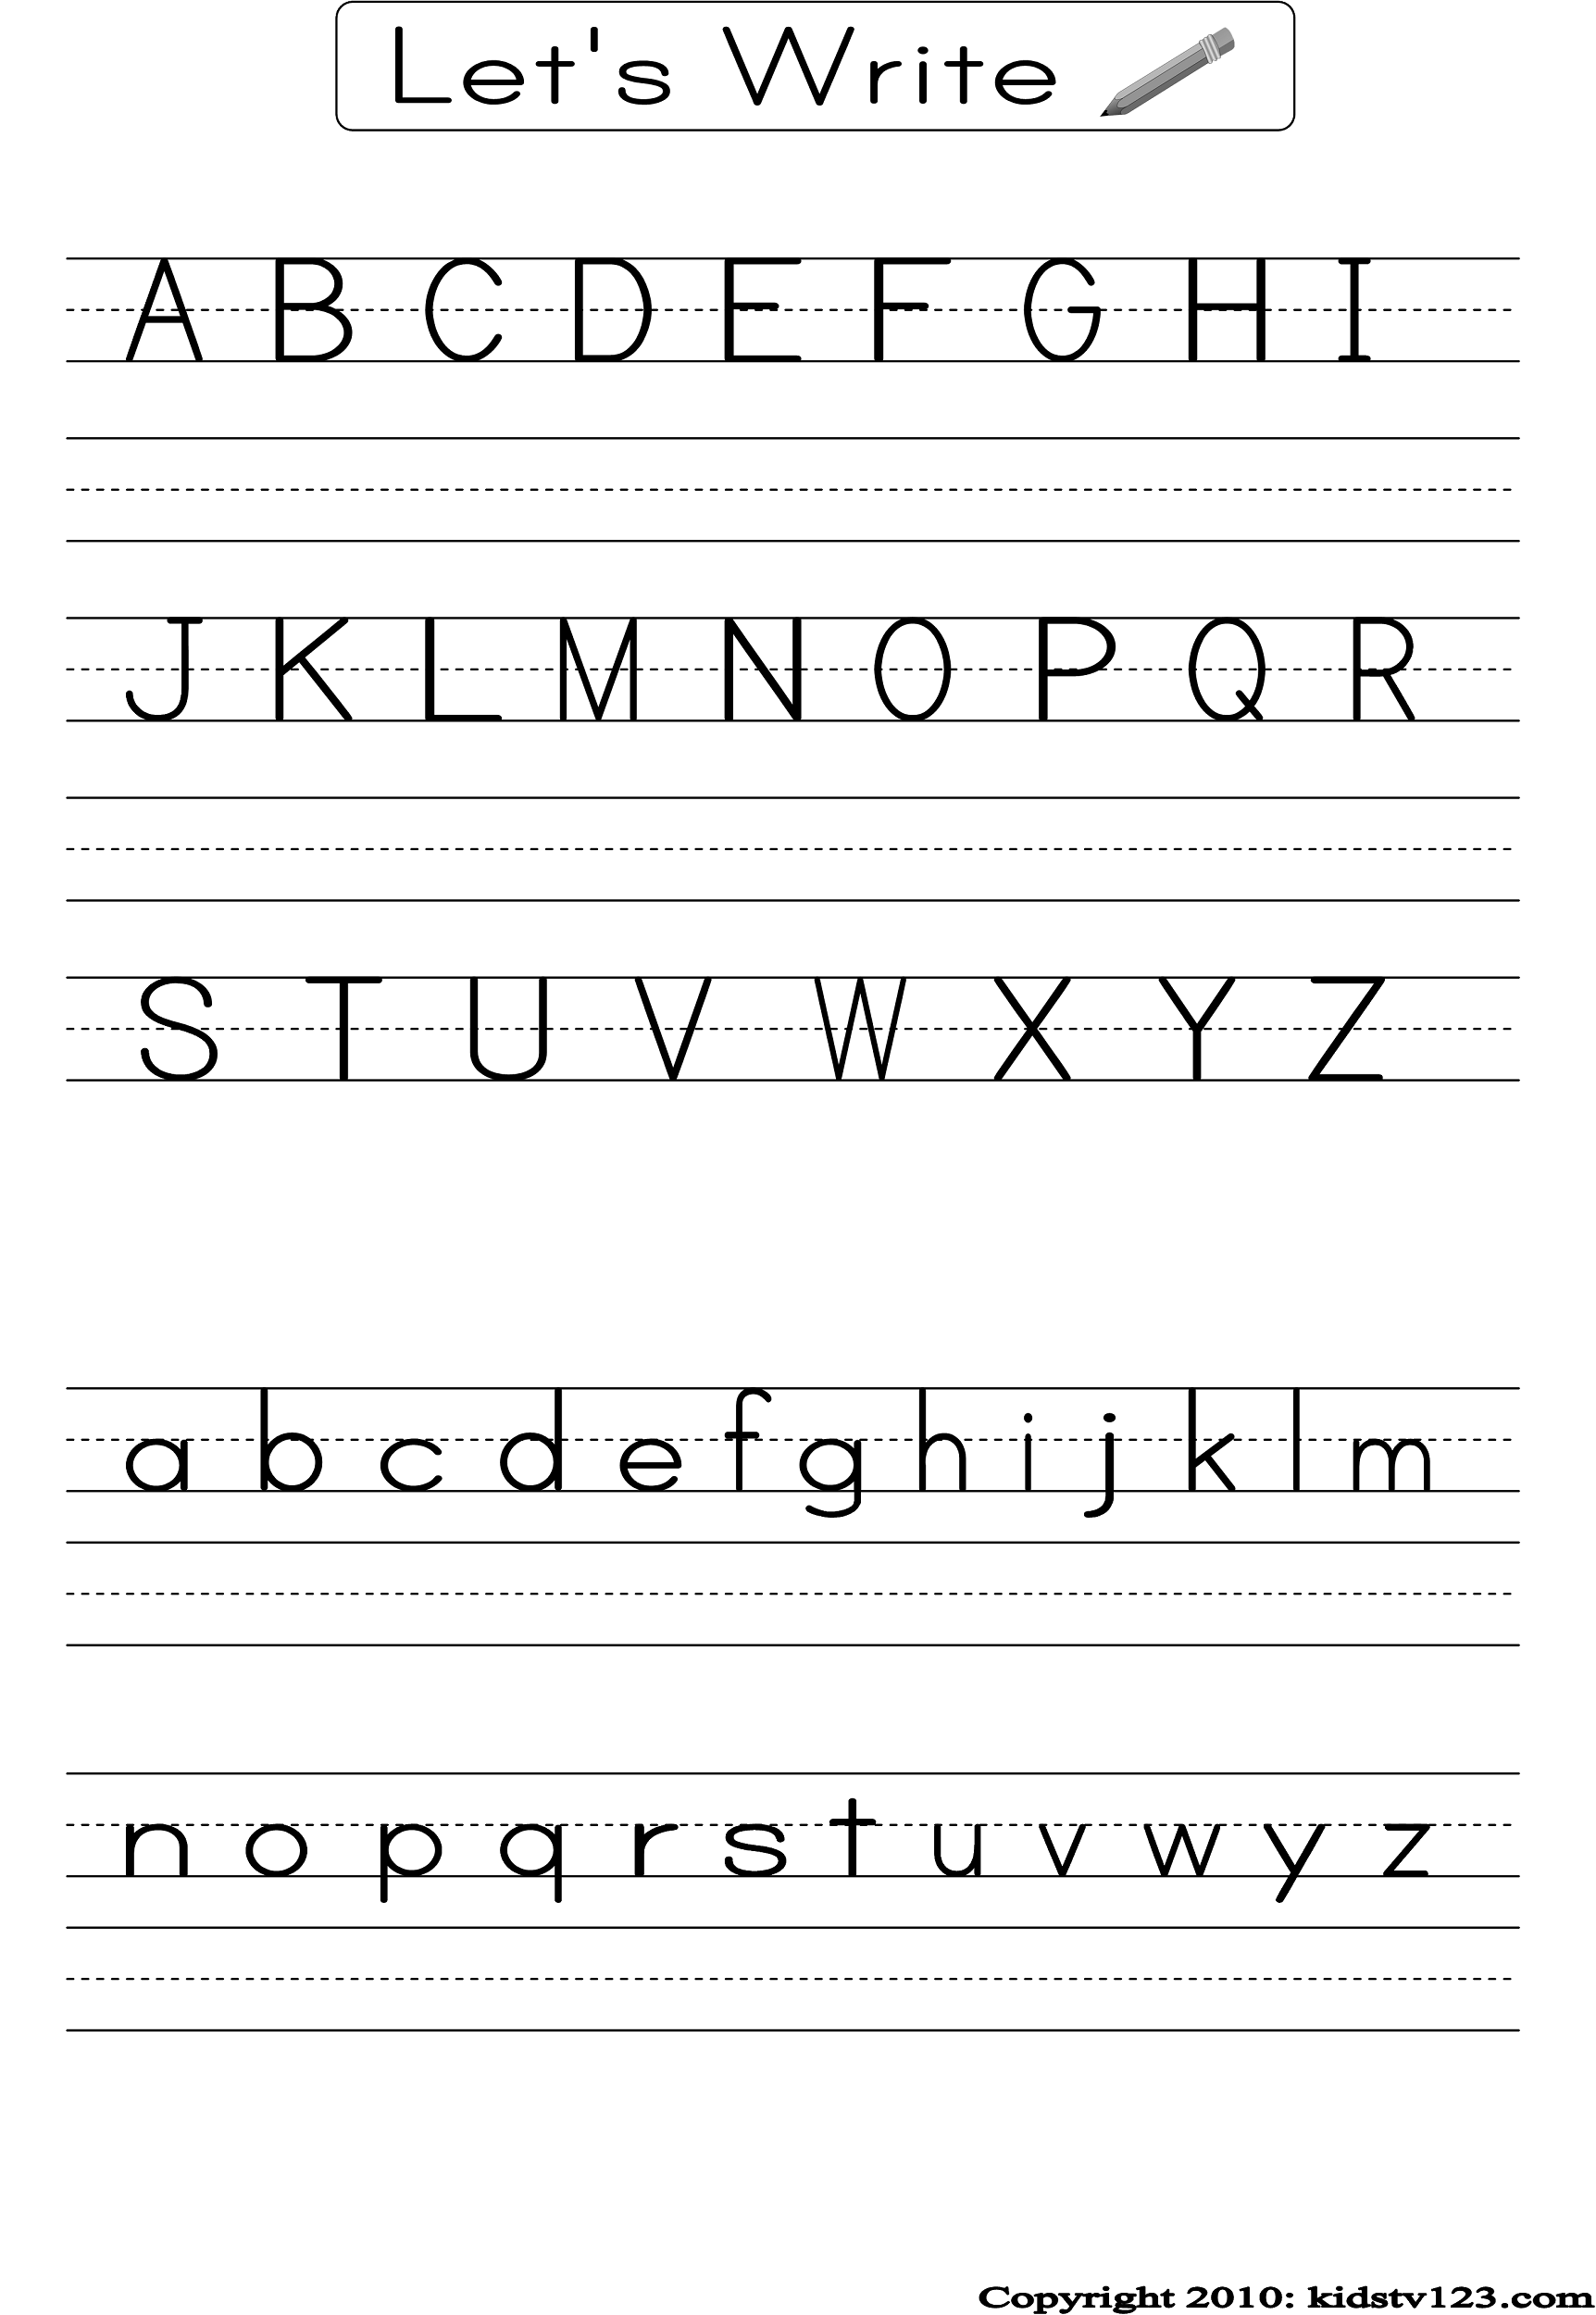 Alphabet Practice Worksheets To Print